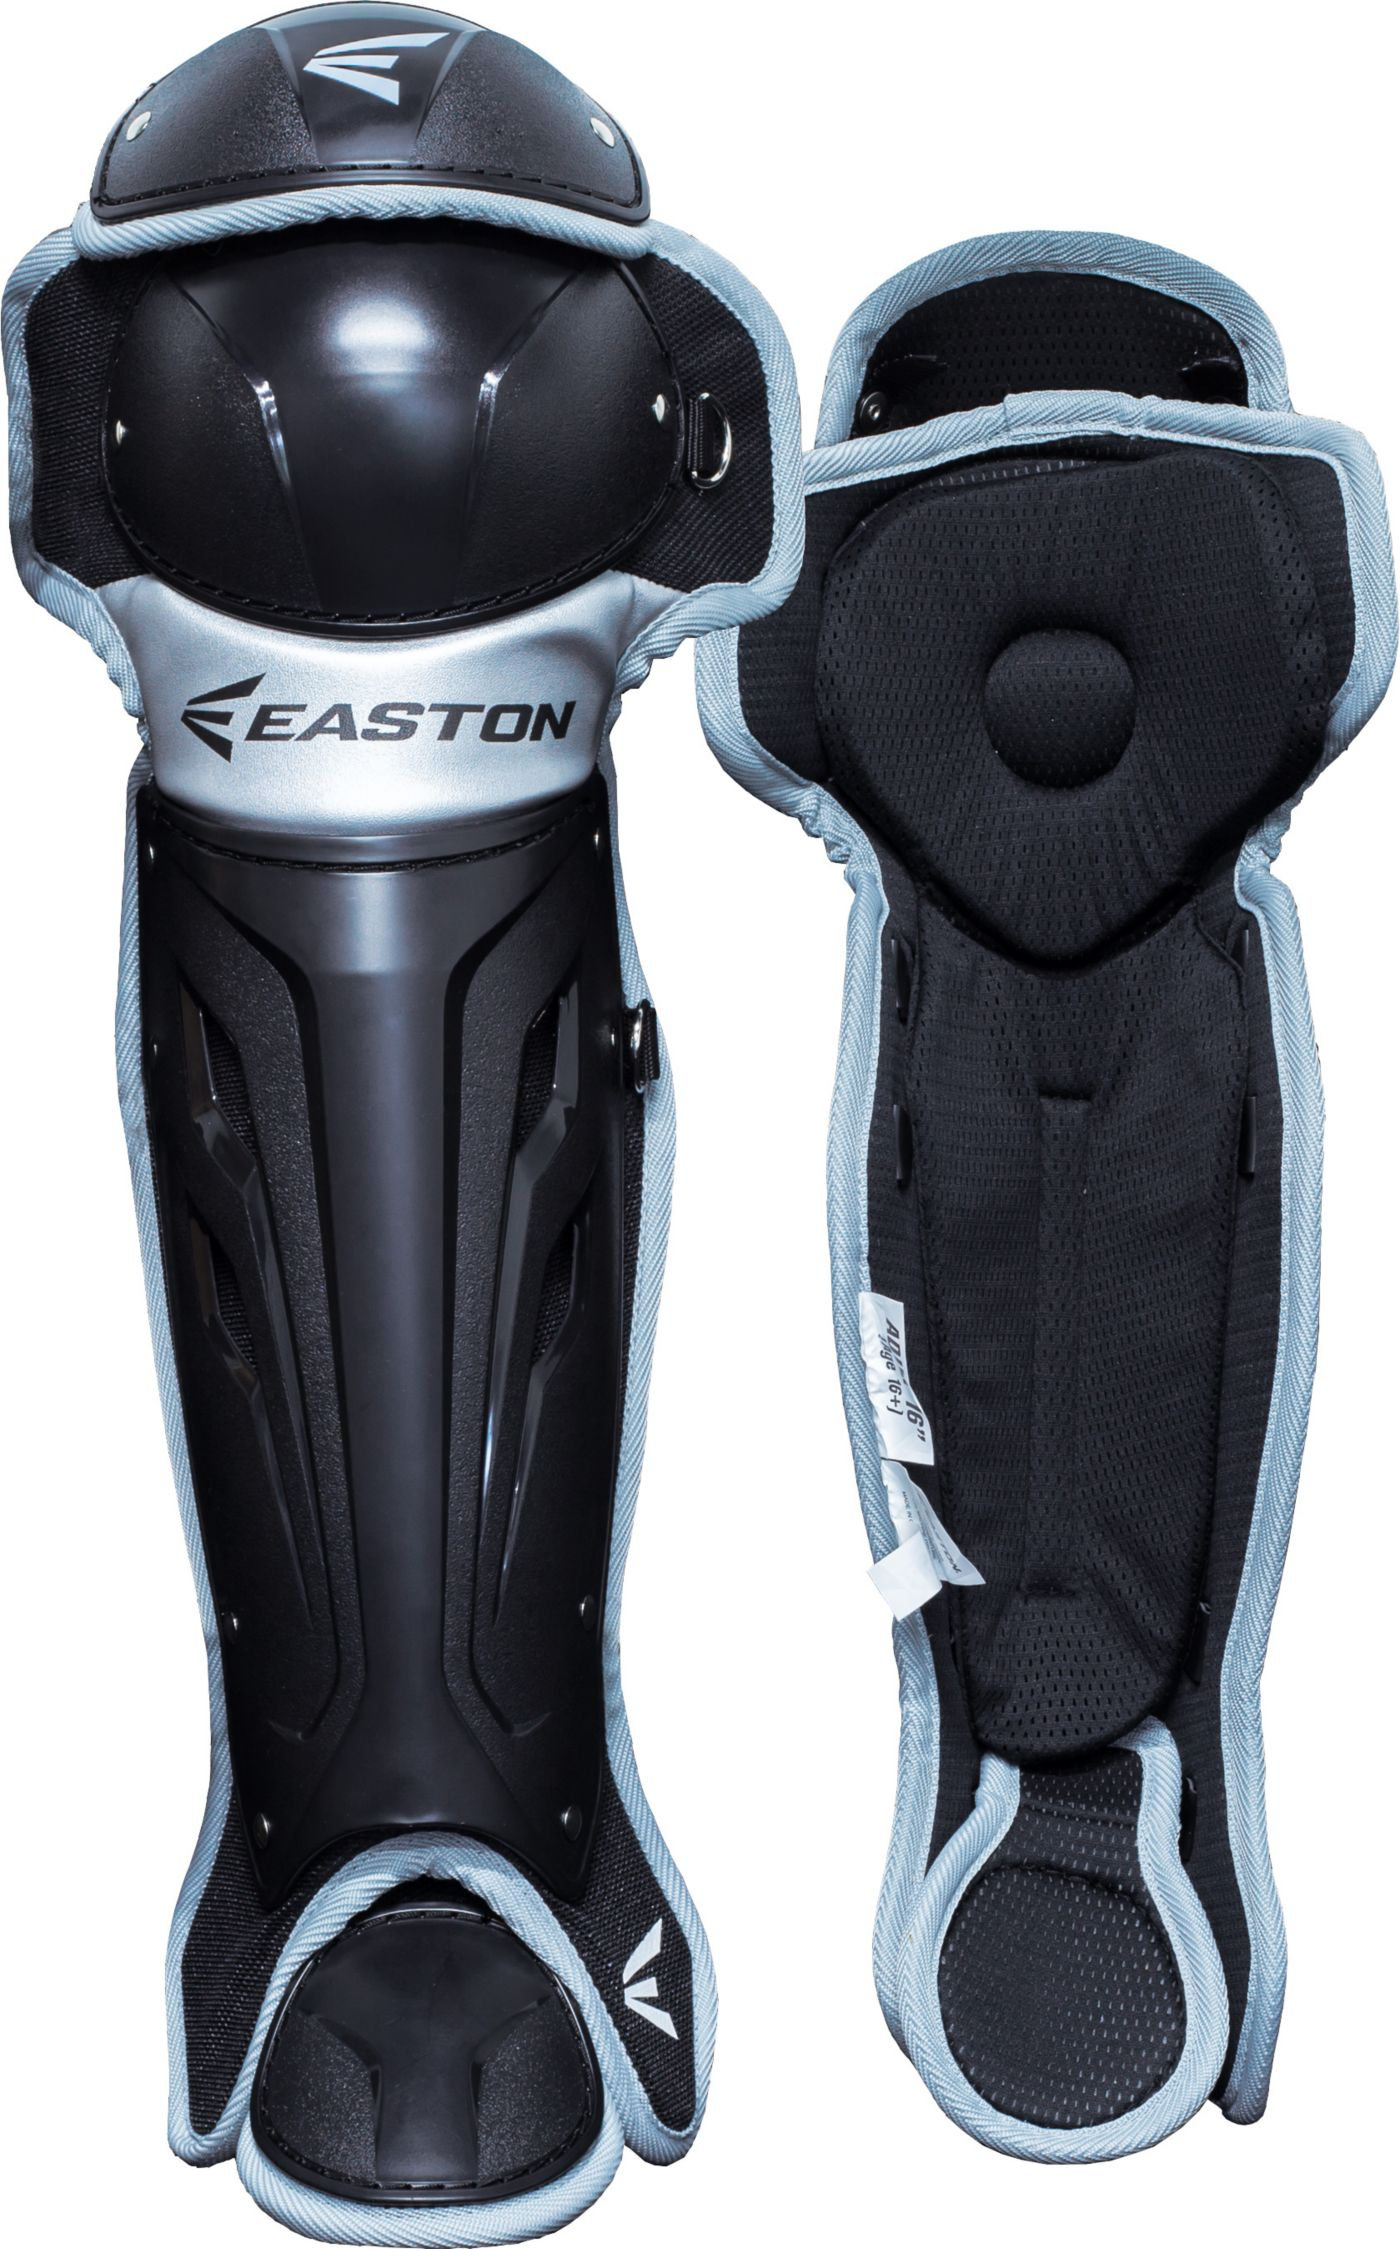 Easton Adult Gametime Elite Leg Guards